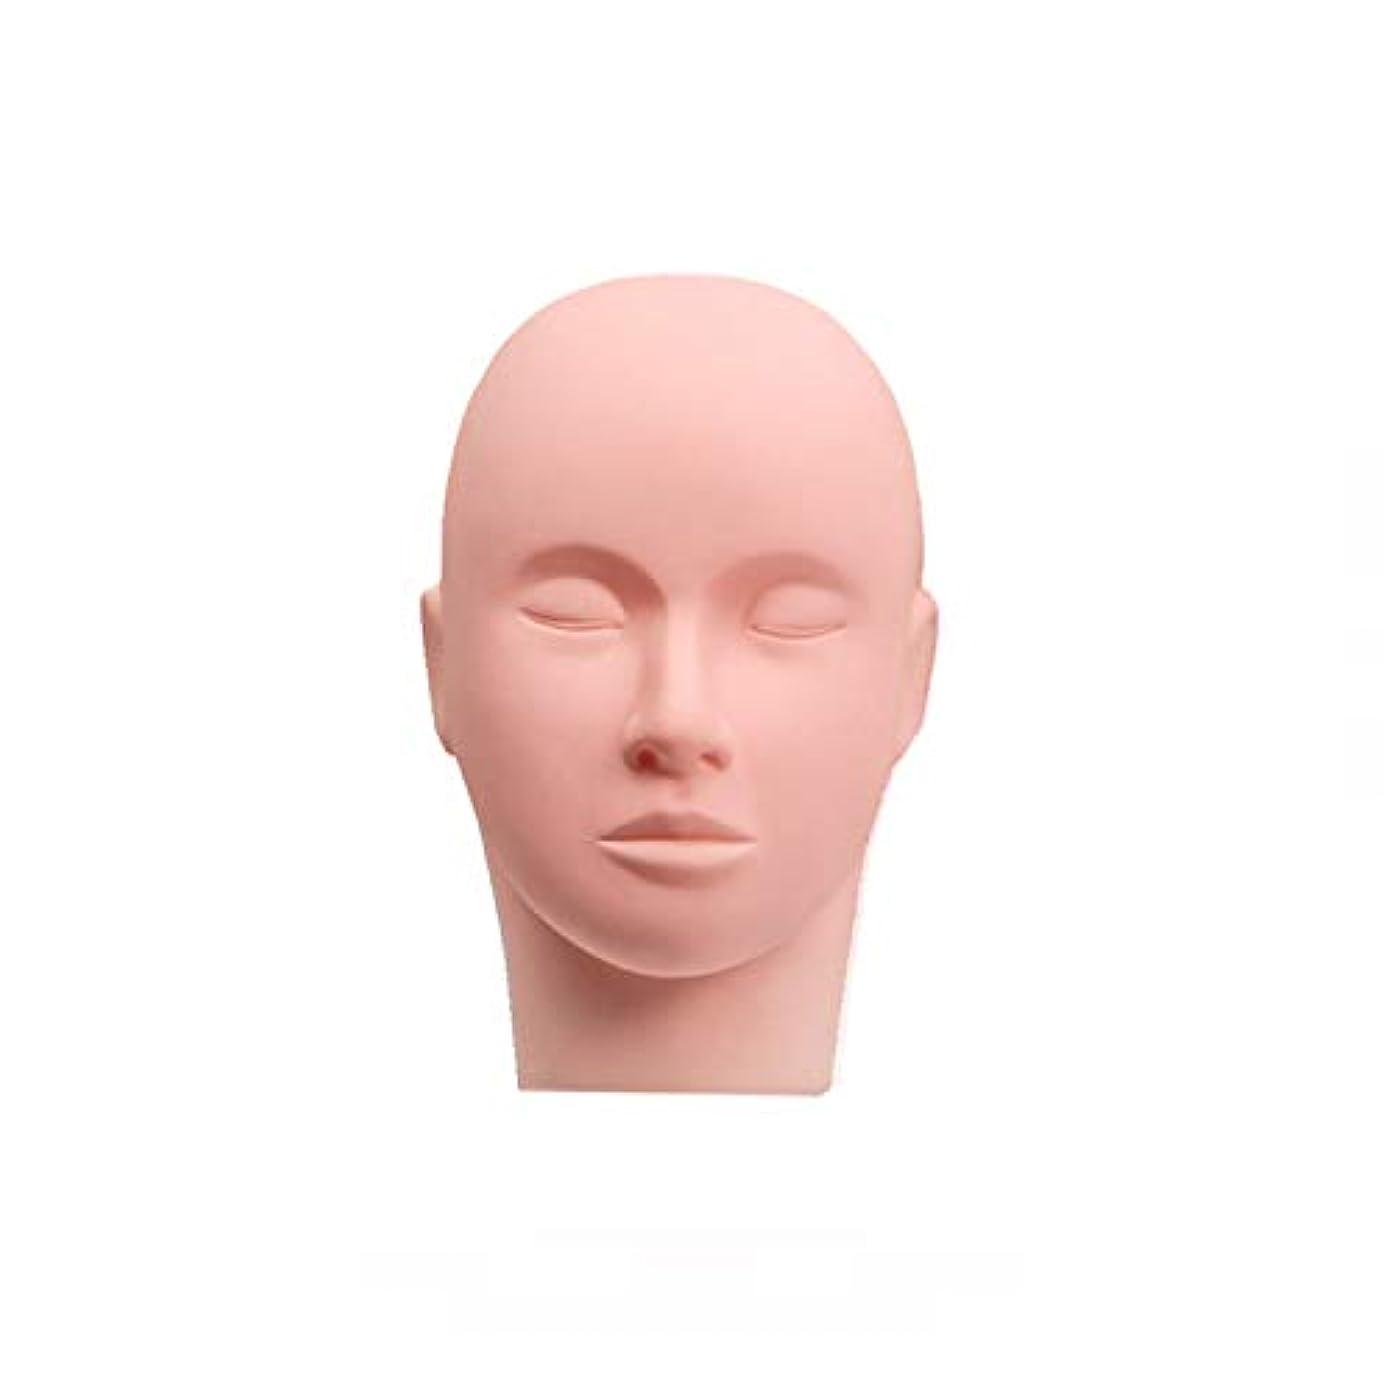 Esthetics Mannequin Head Pro Rubber Practice Training Head Cosmetology Mannequin Doll Face Head for Eyelashes Makeup Practice - Makeup Practice Head